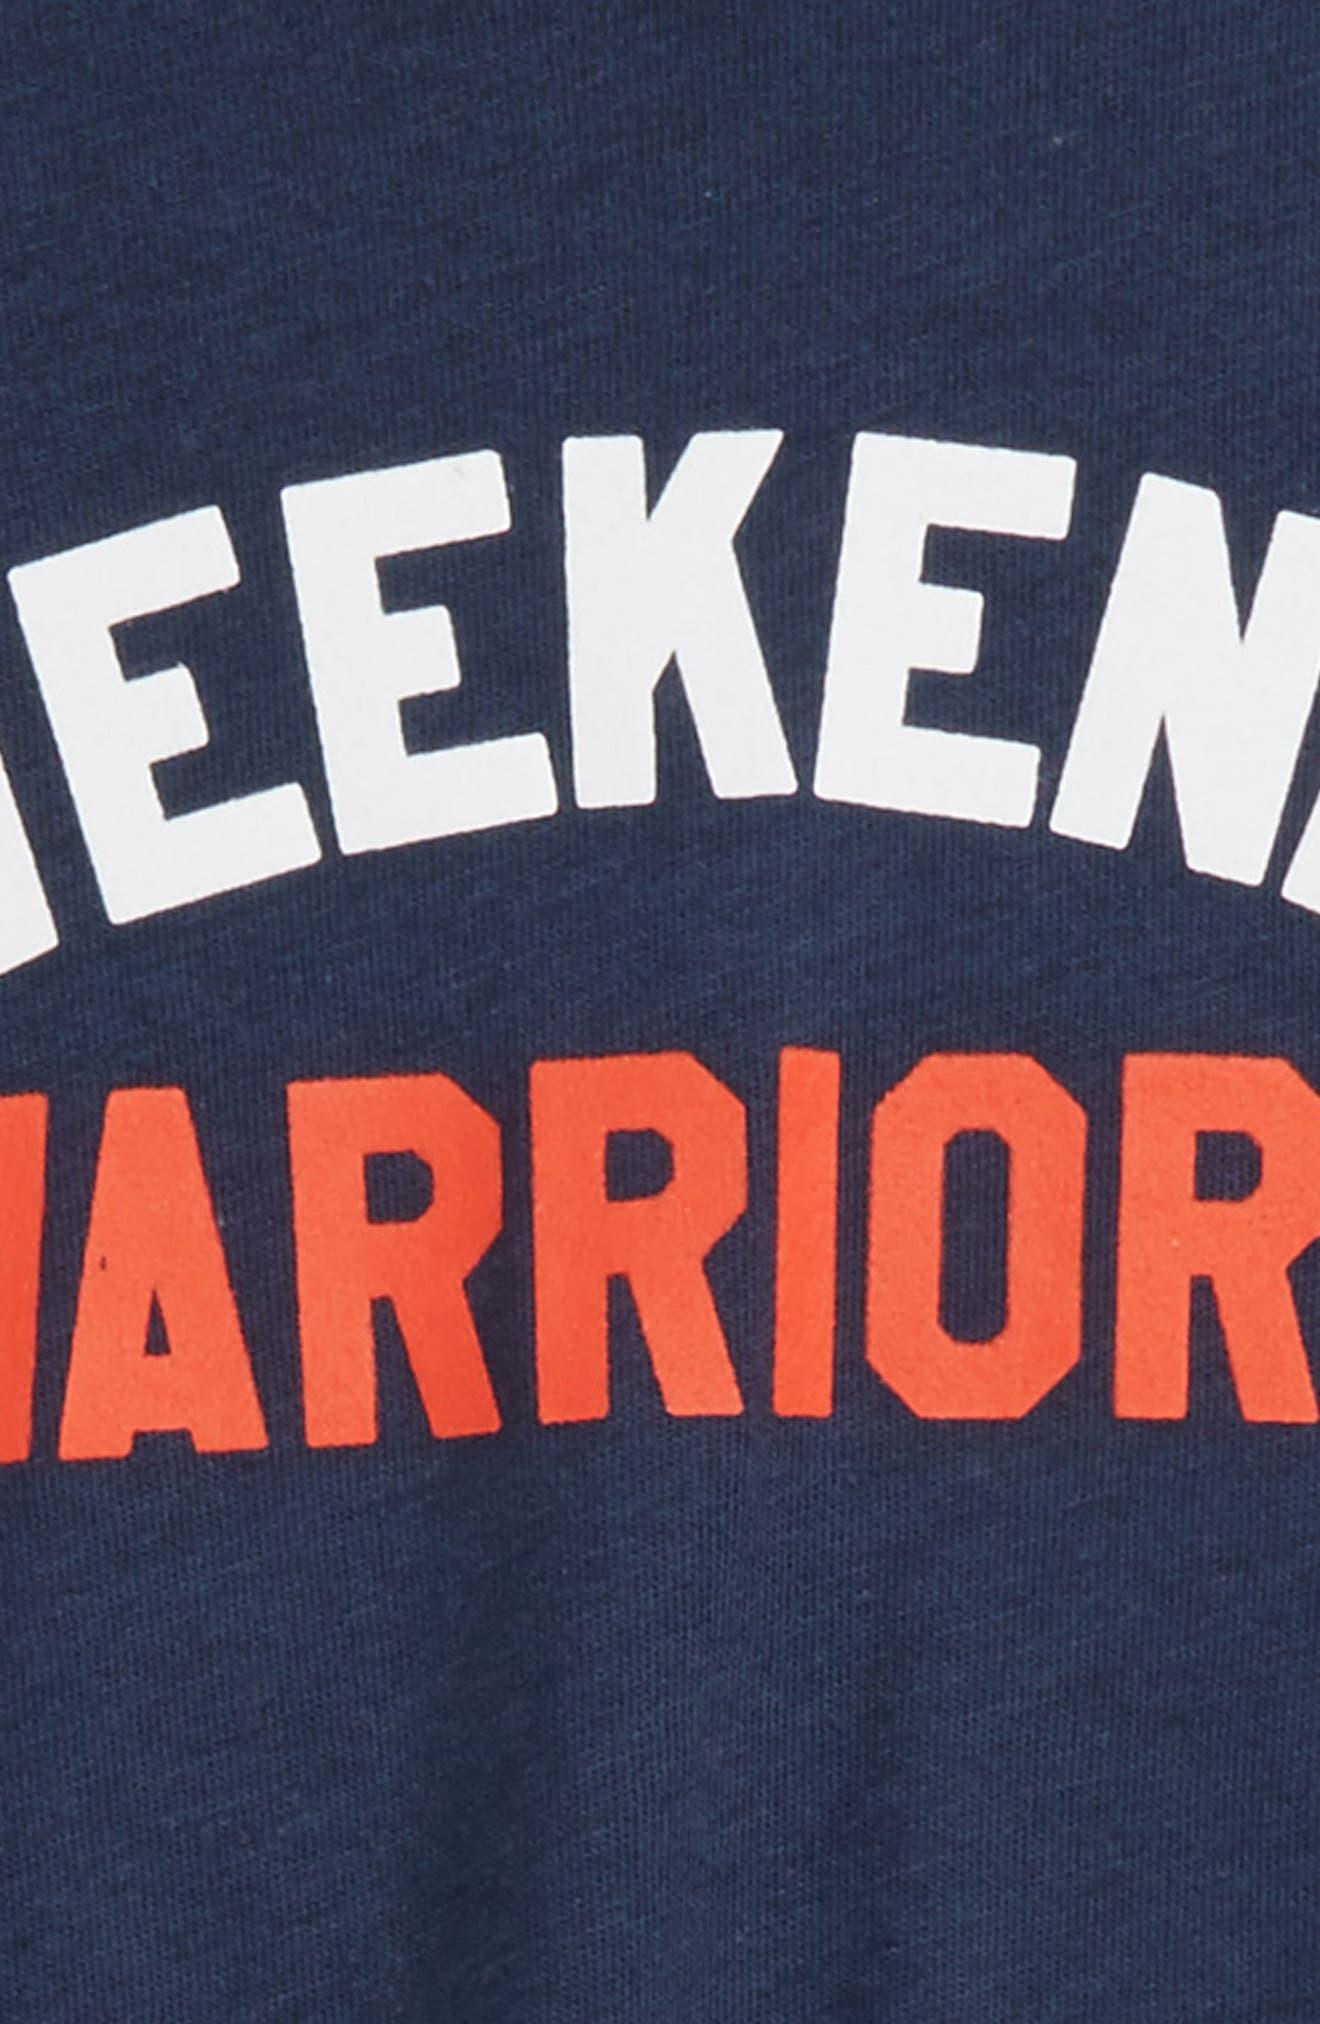 Weekend Warriors Tee,                             Alternate thumbnail 2, color,                             410